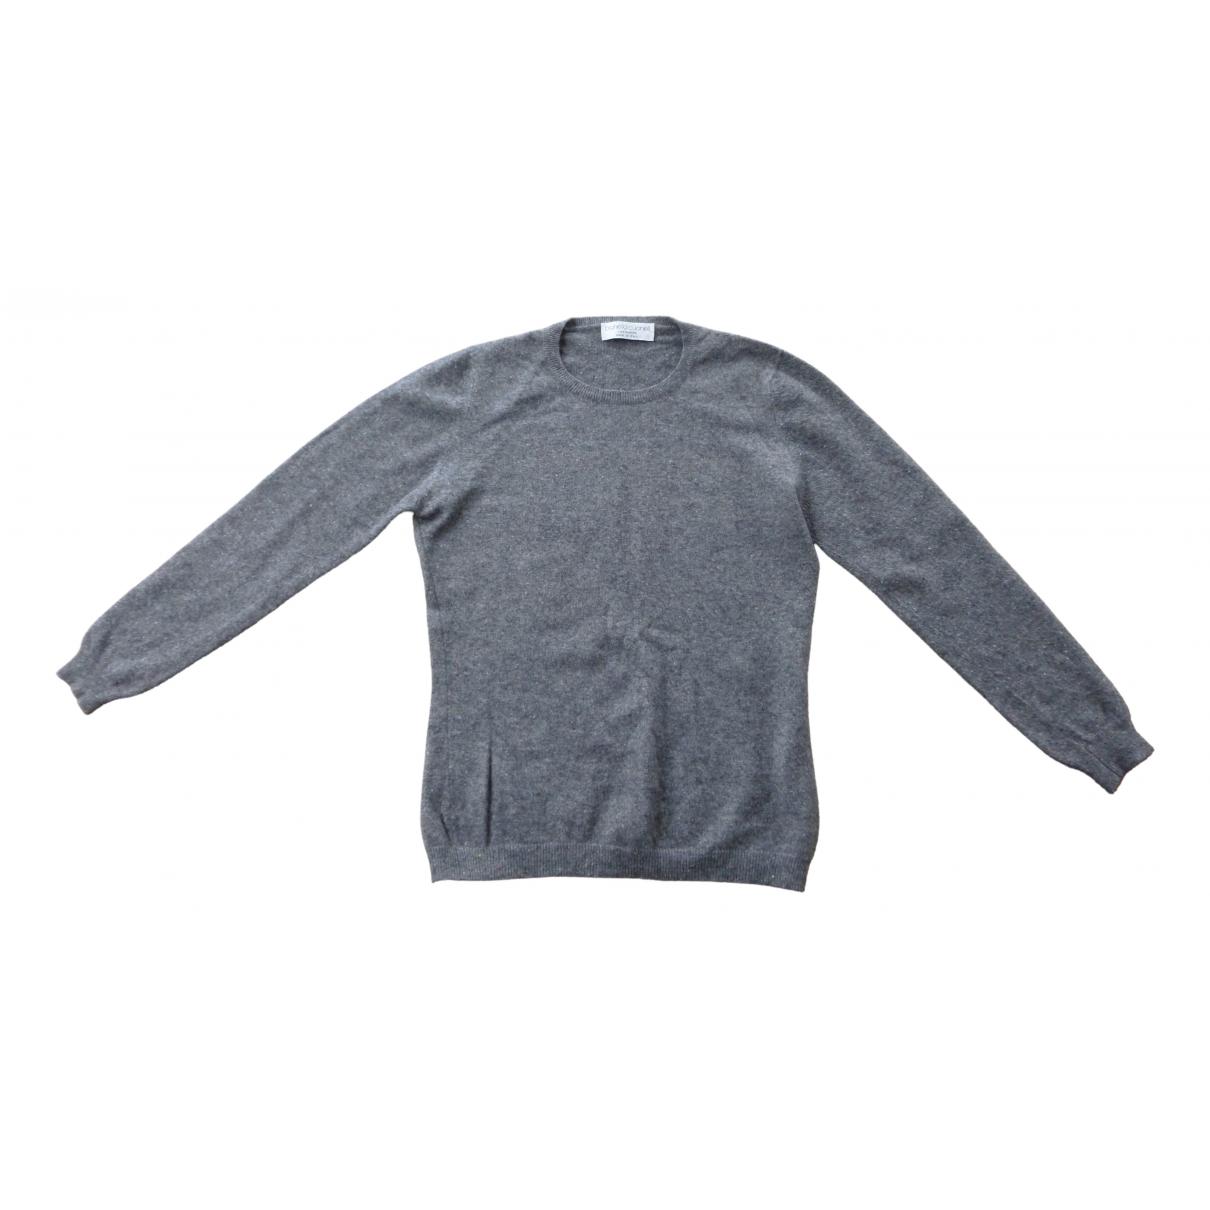 Brunello Cucinelli N Cashmere Knitwear for Women S International